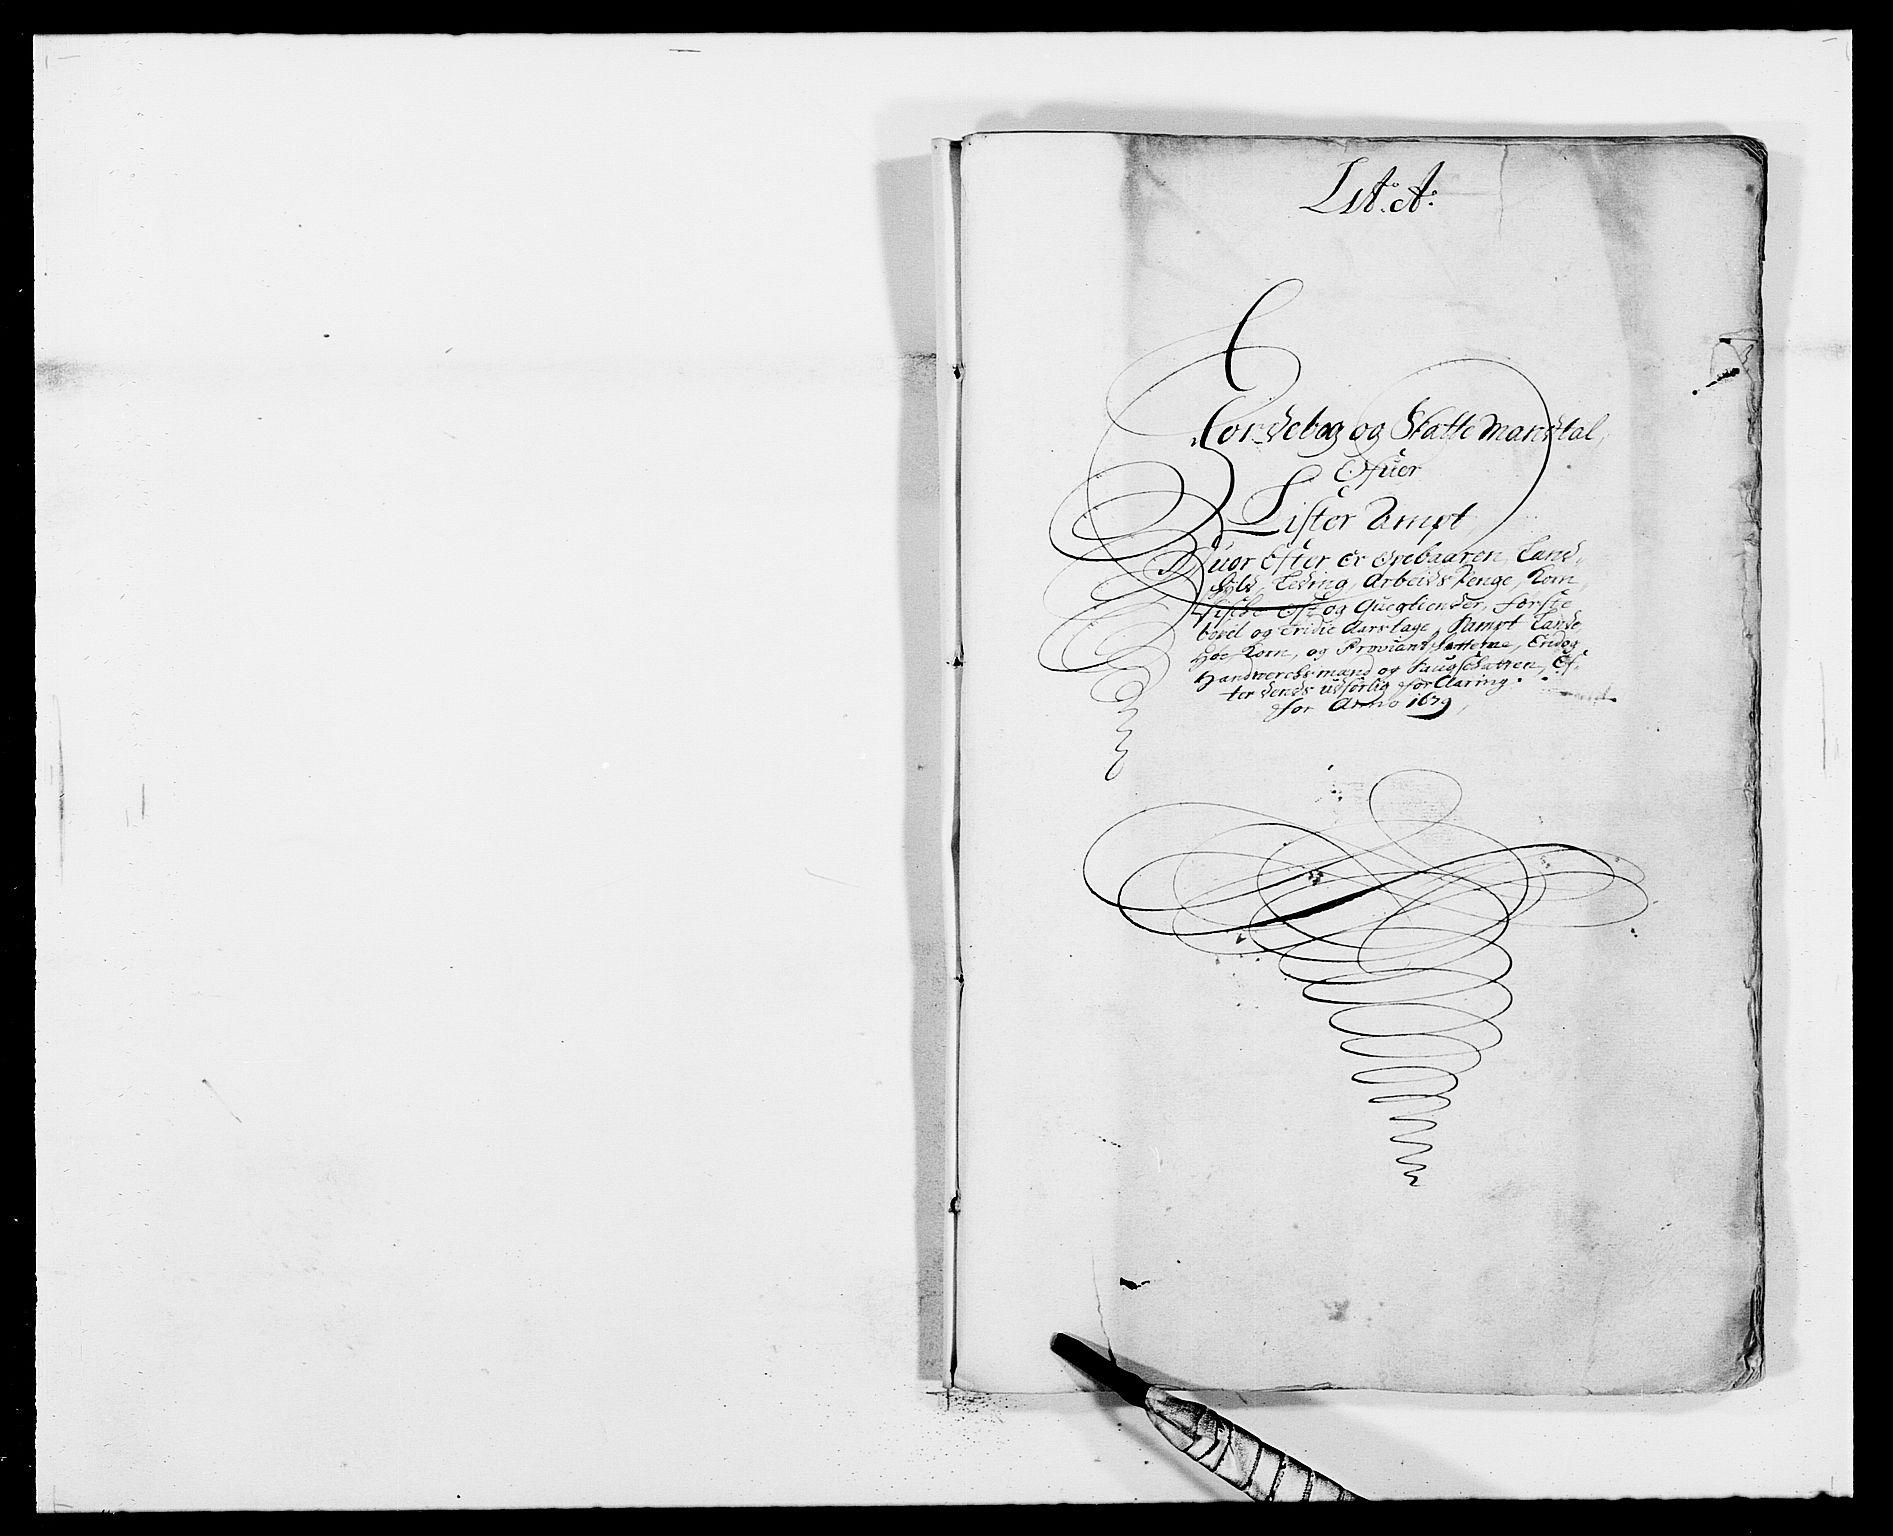 RA, Rentekammeret inntil 1814, Reviderte regnskaper, Fogderegnskap, R41/L2530: Fogderegnskap Lista, 1677-1679, s. 304